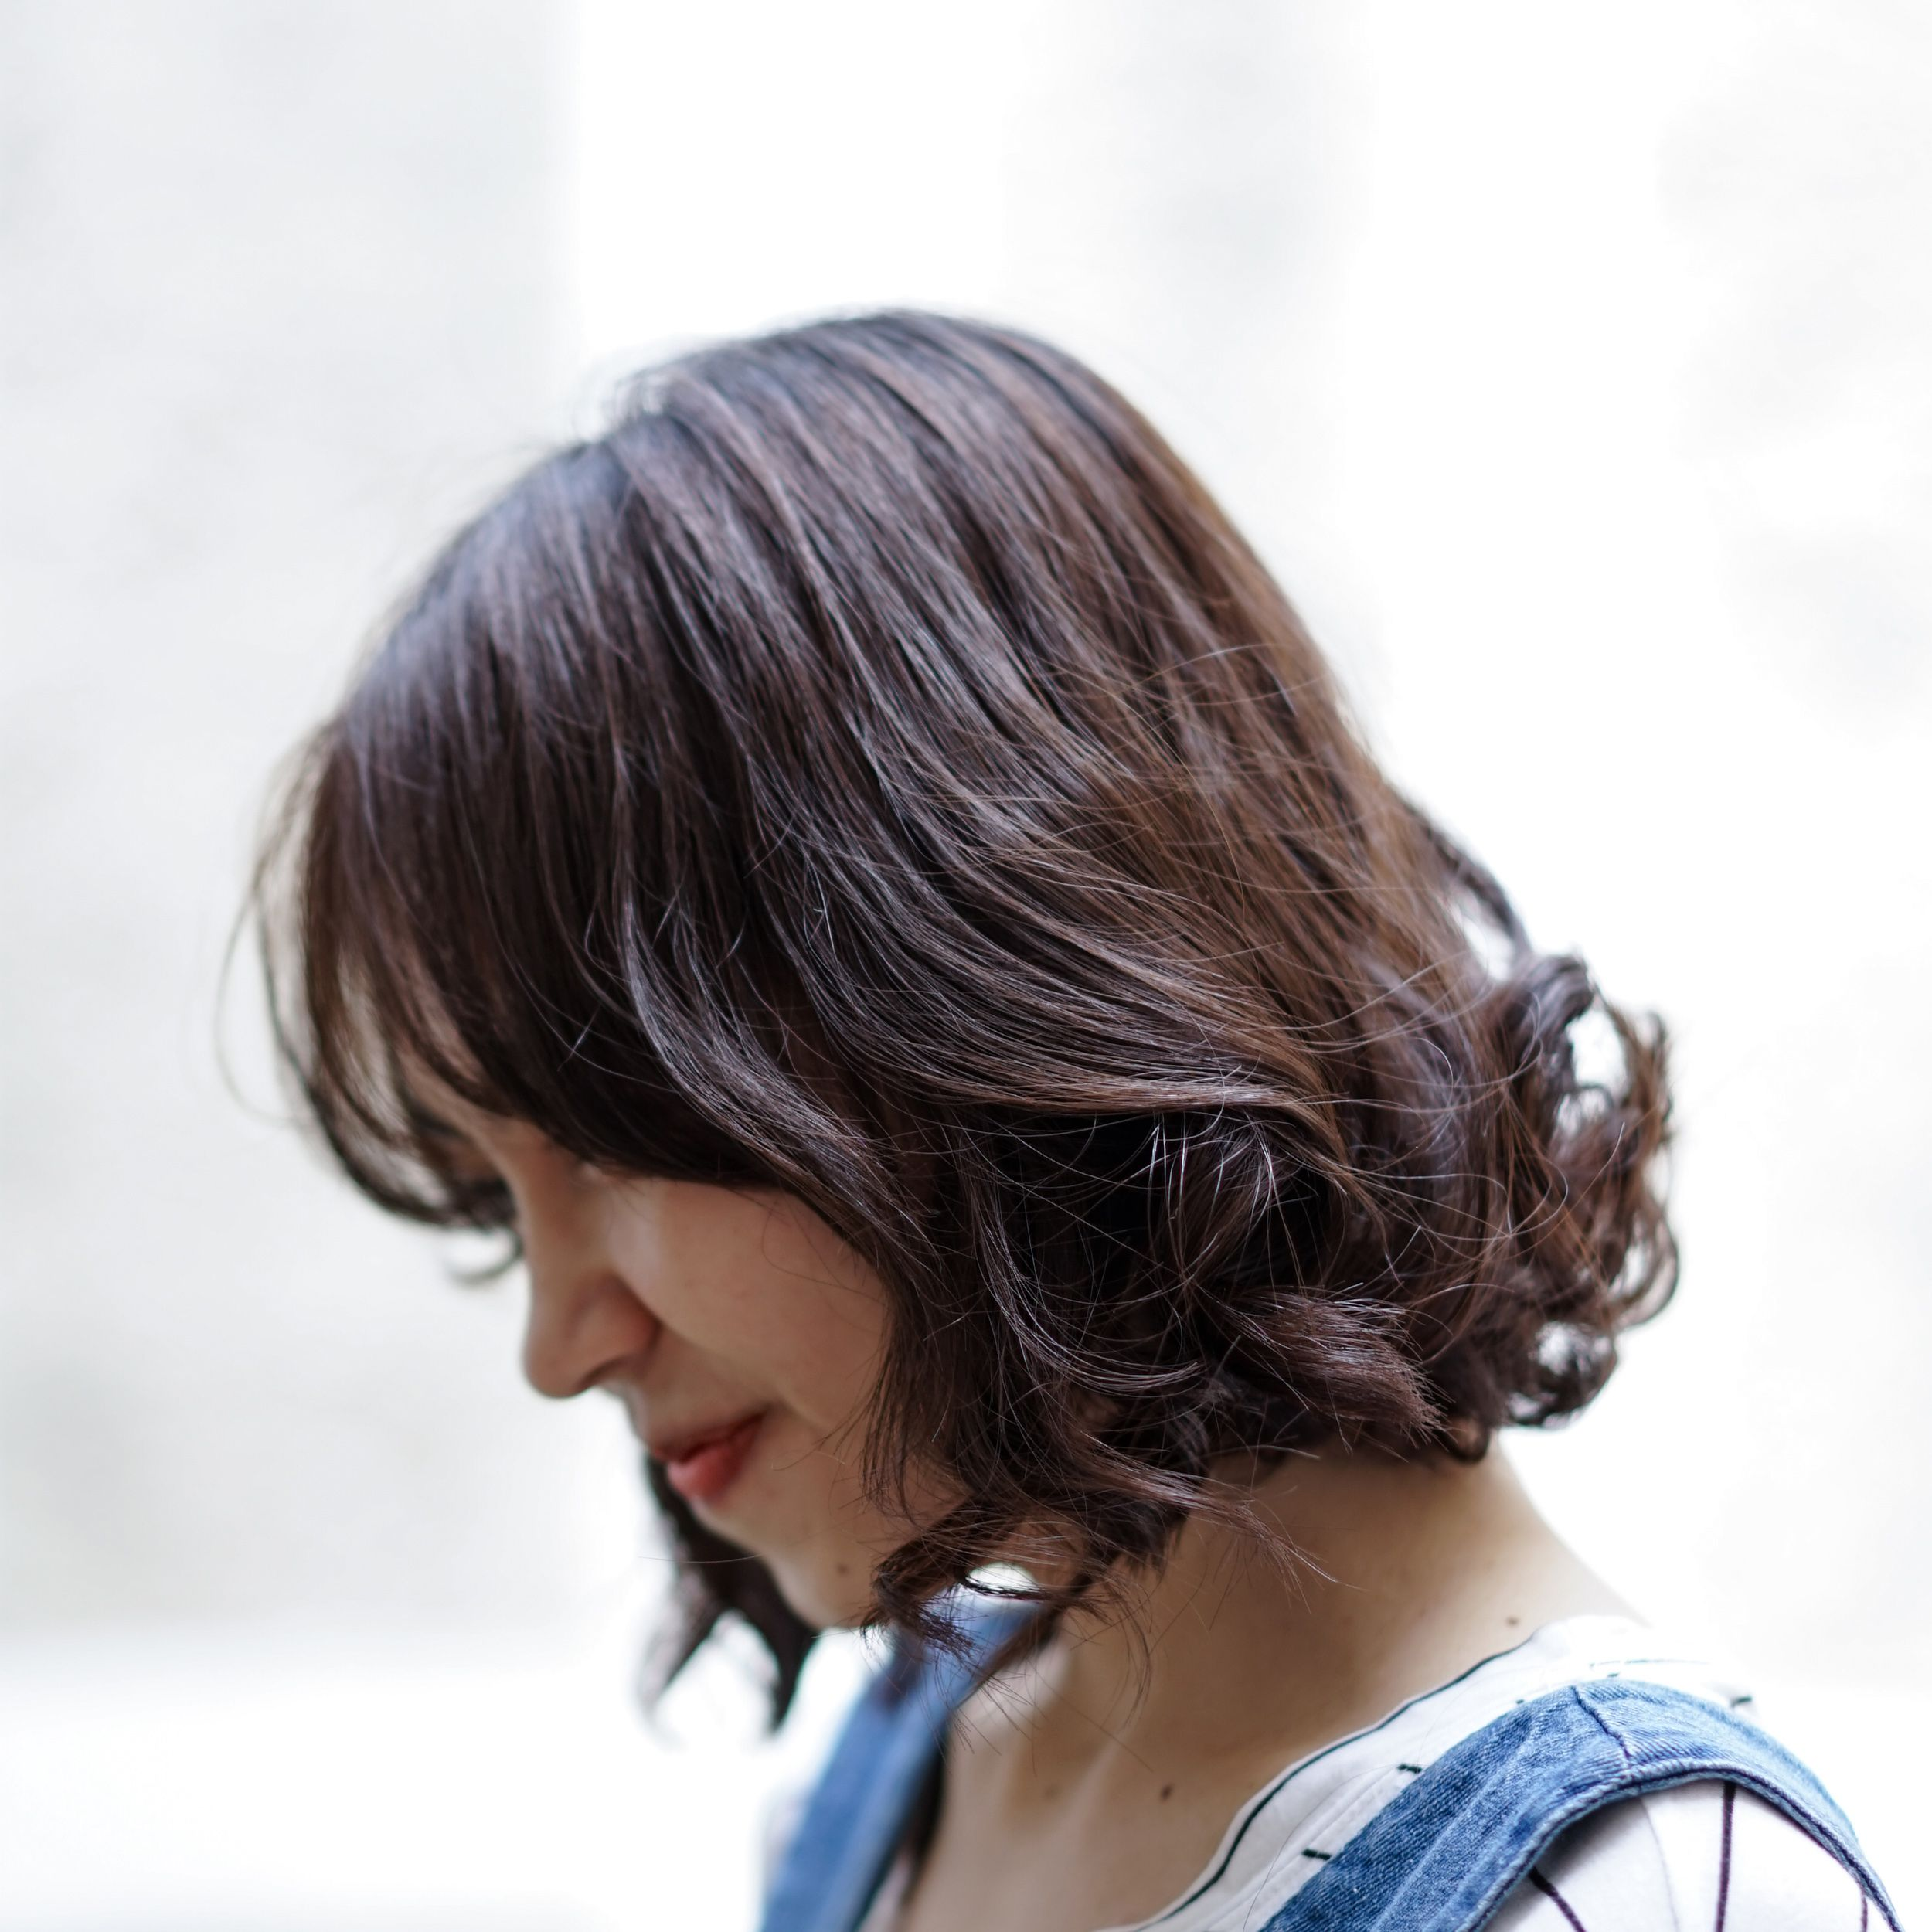 Hair Styling Idea For Short Hair Curl Cny Hairstyle Idea